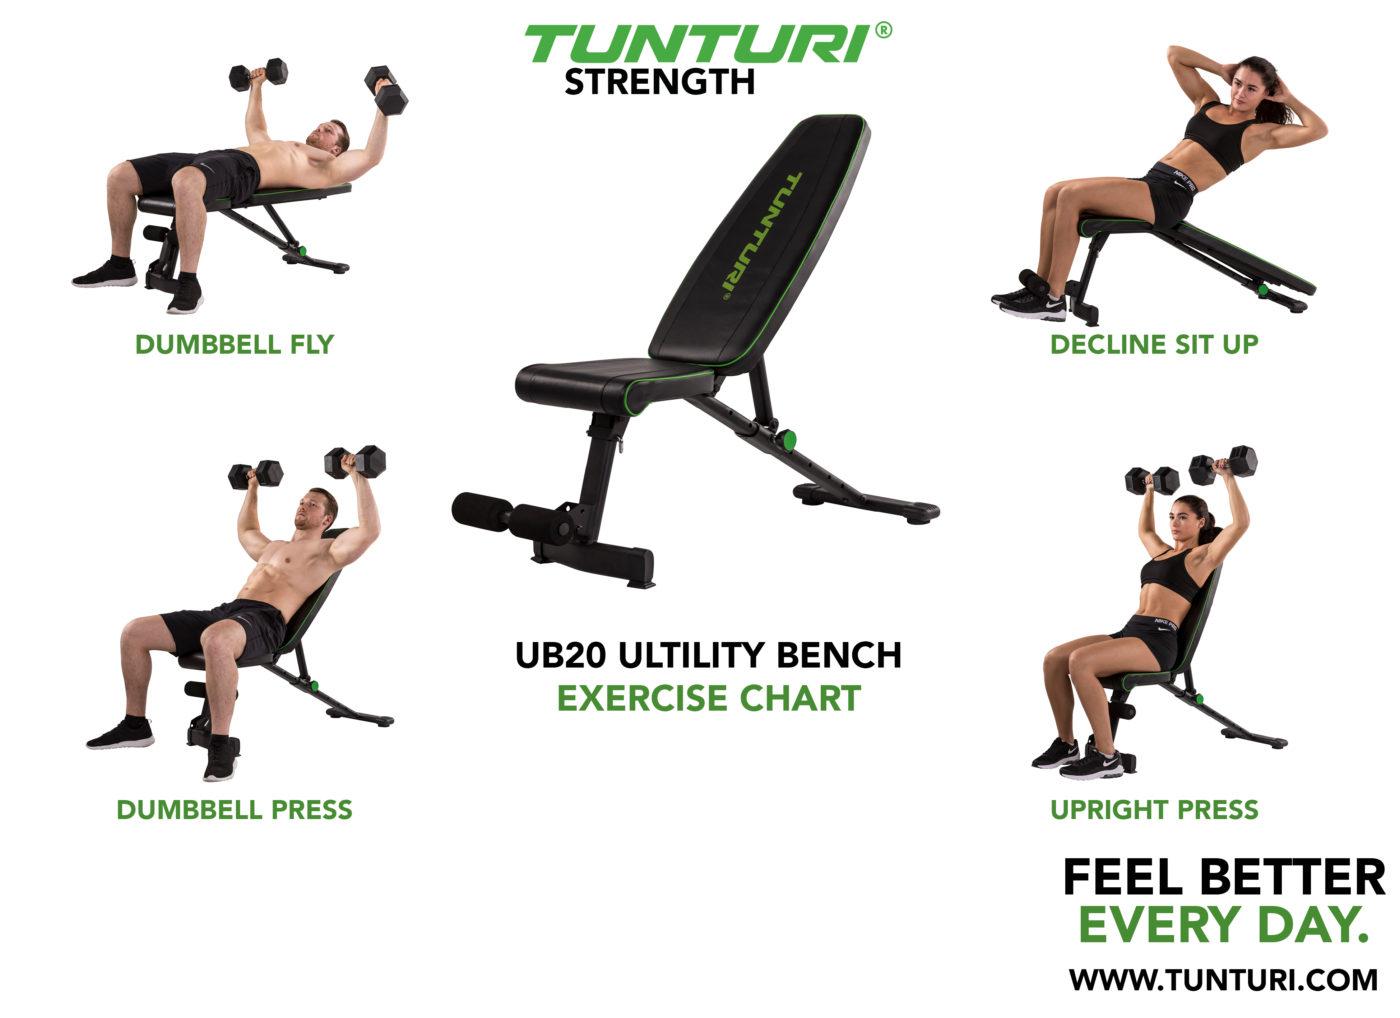 Tunturi UB20 Utility Bench Verstelbare halterbank - Fitnessbank - Buikspierbank - Trainingsbank